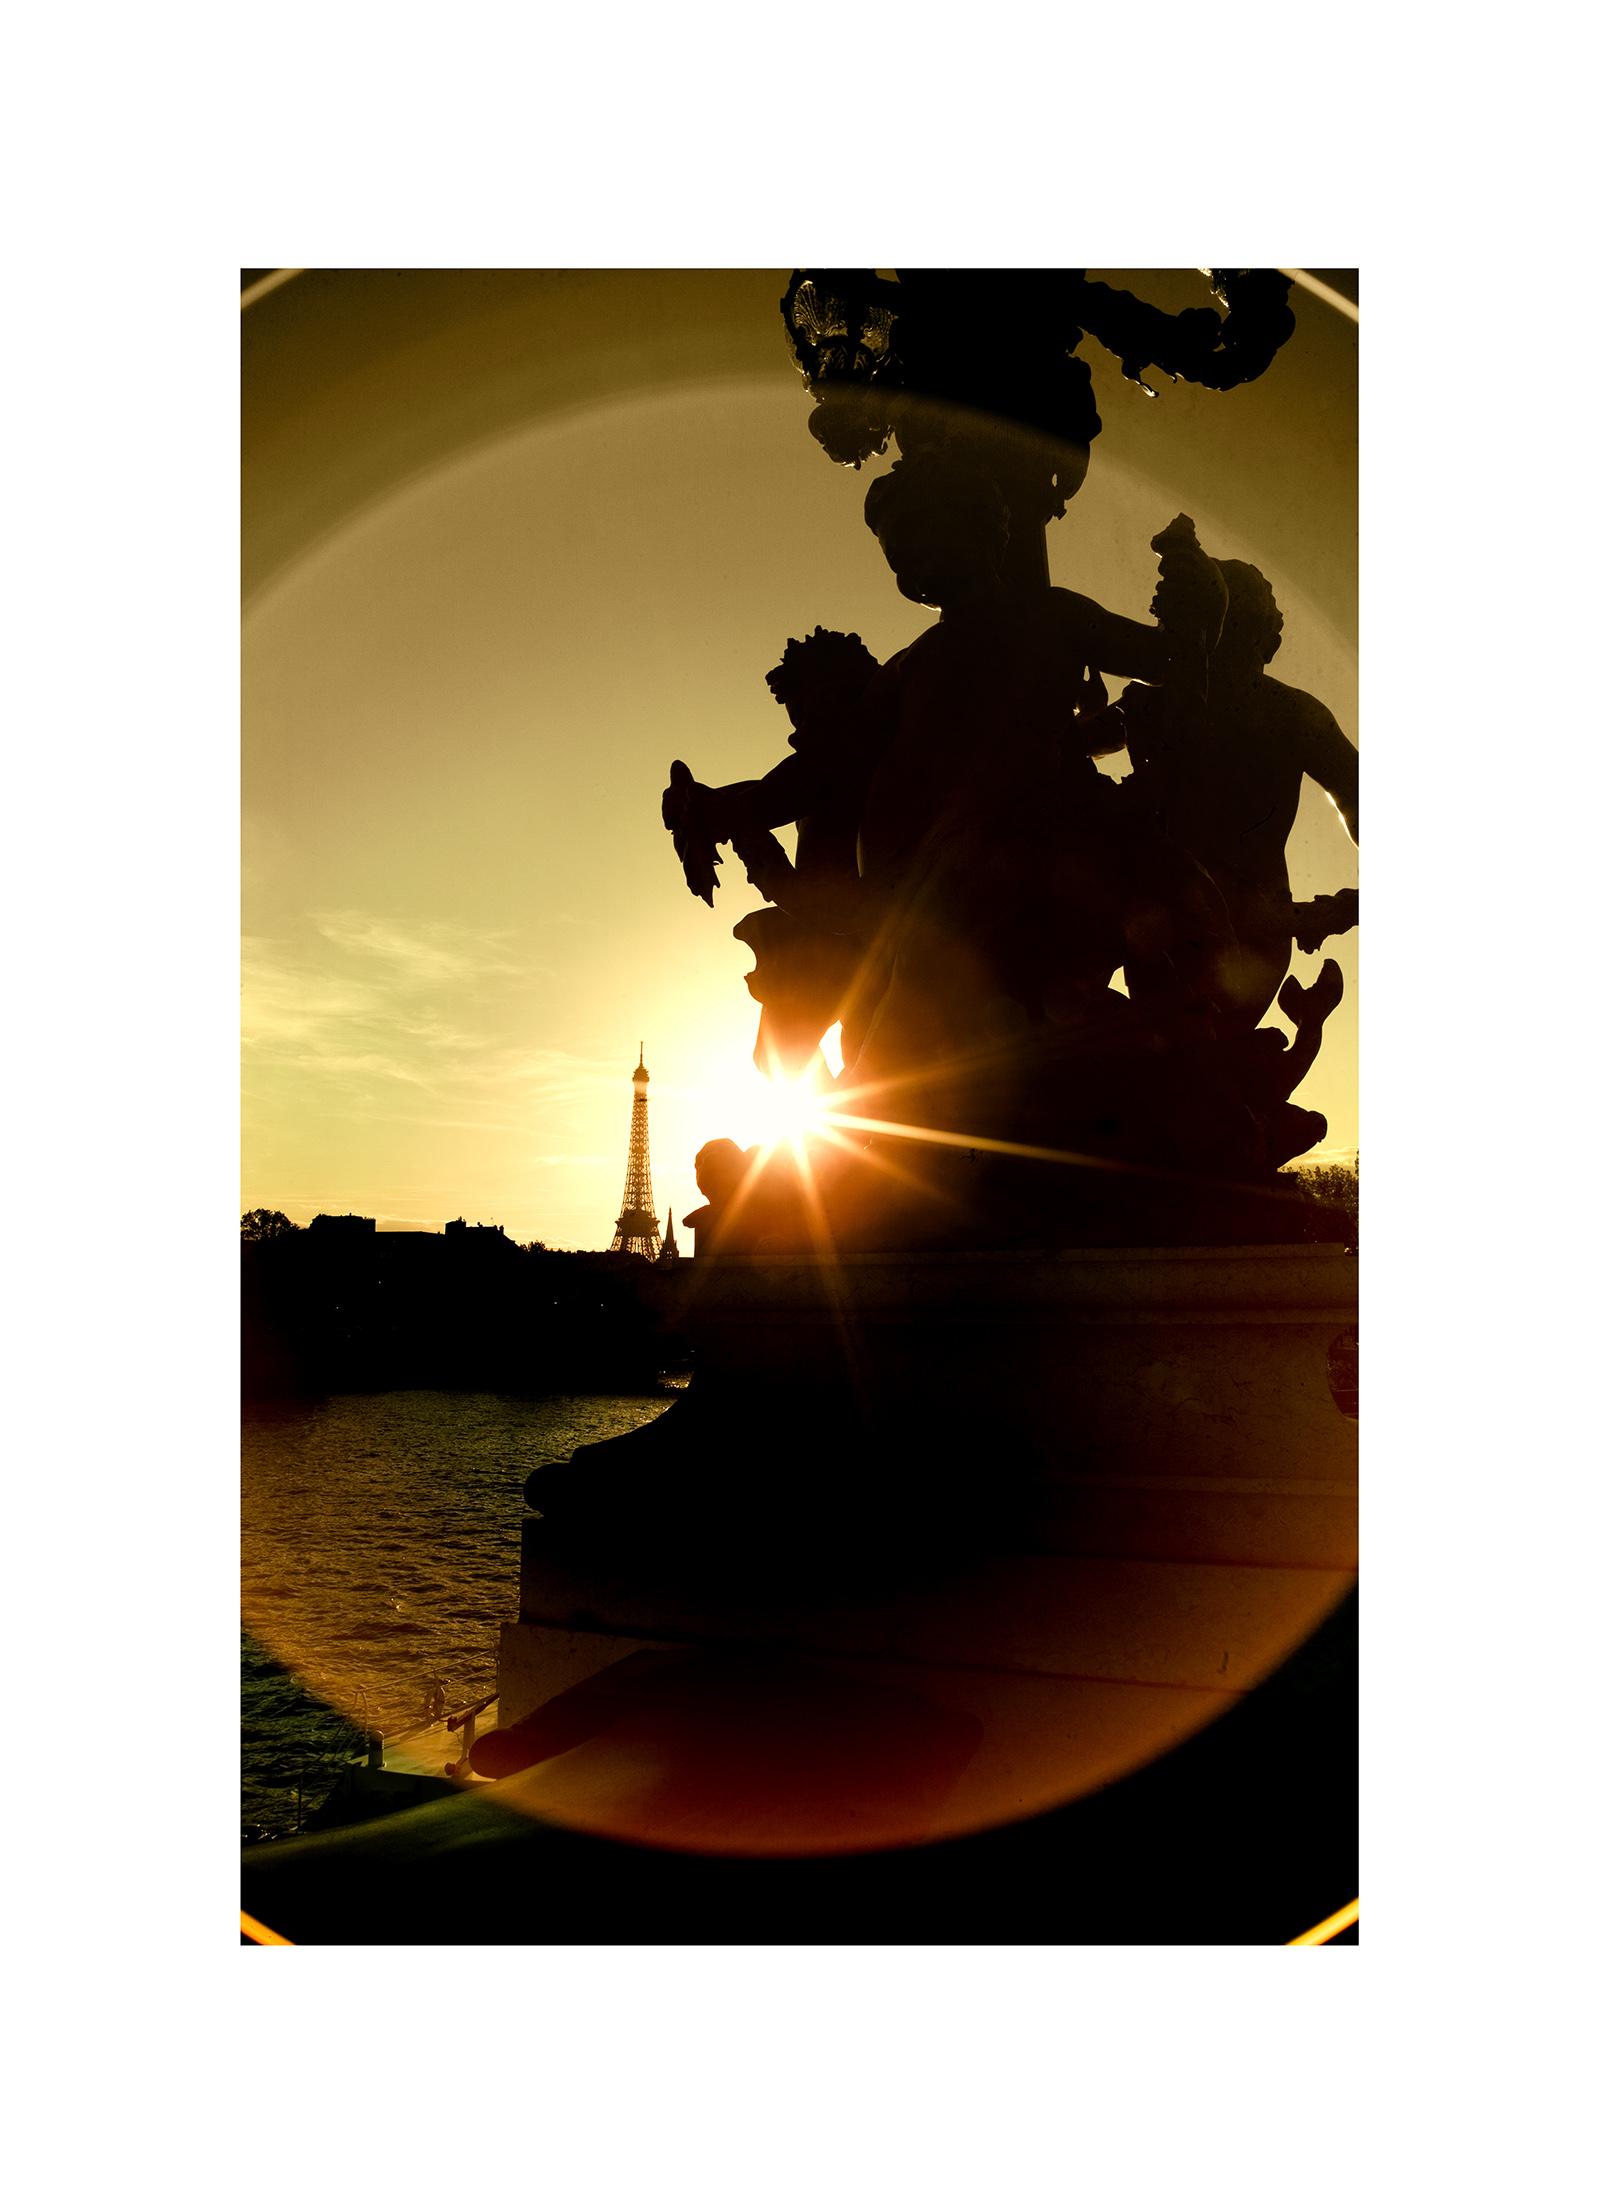 Paris_MG_9854.jpg